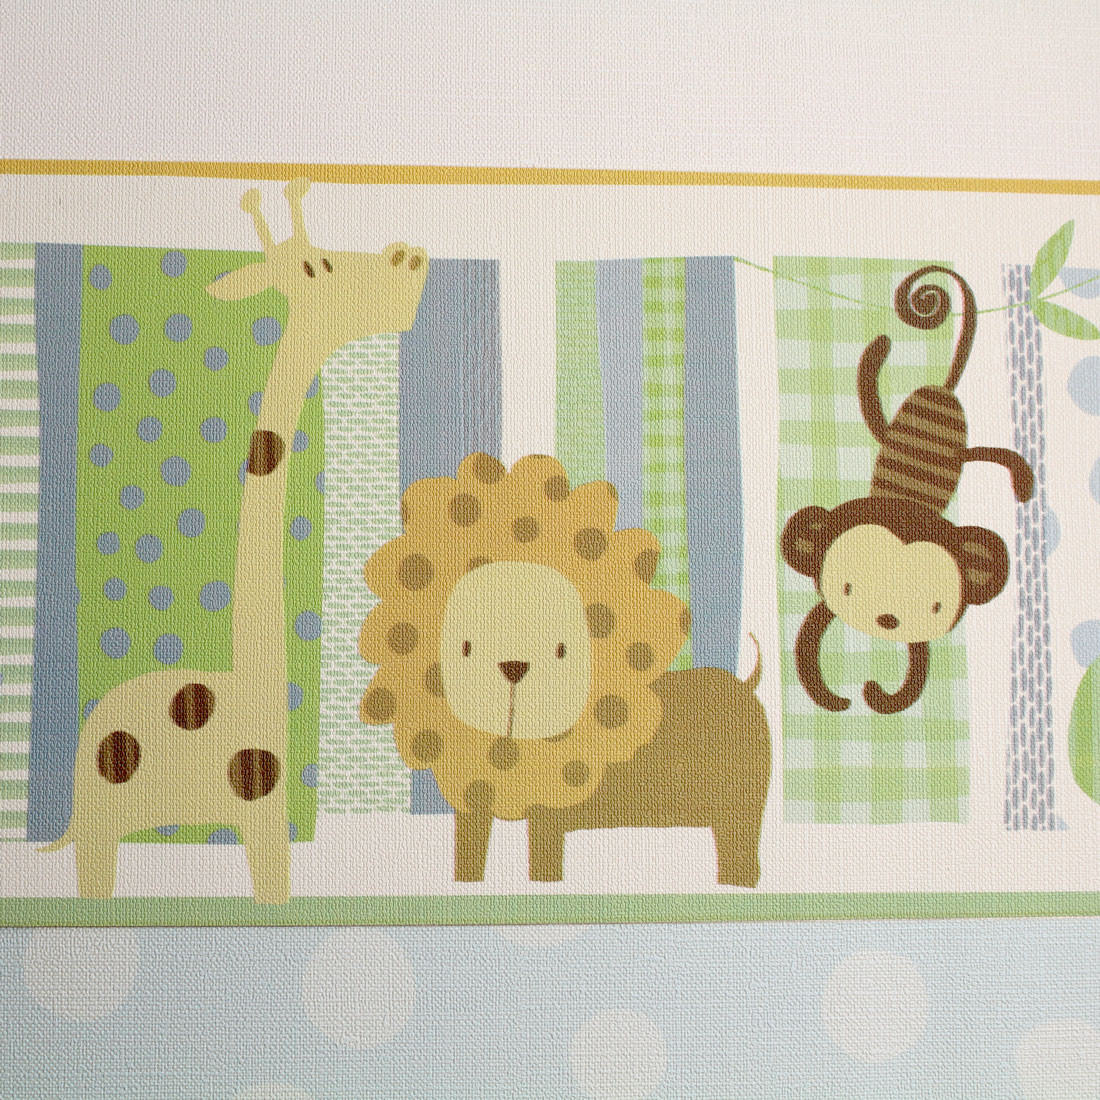 Faixa Decorativa Infantil Safári Savana - Nido